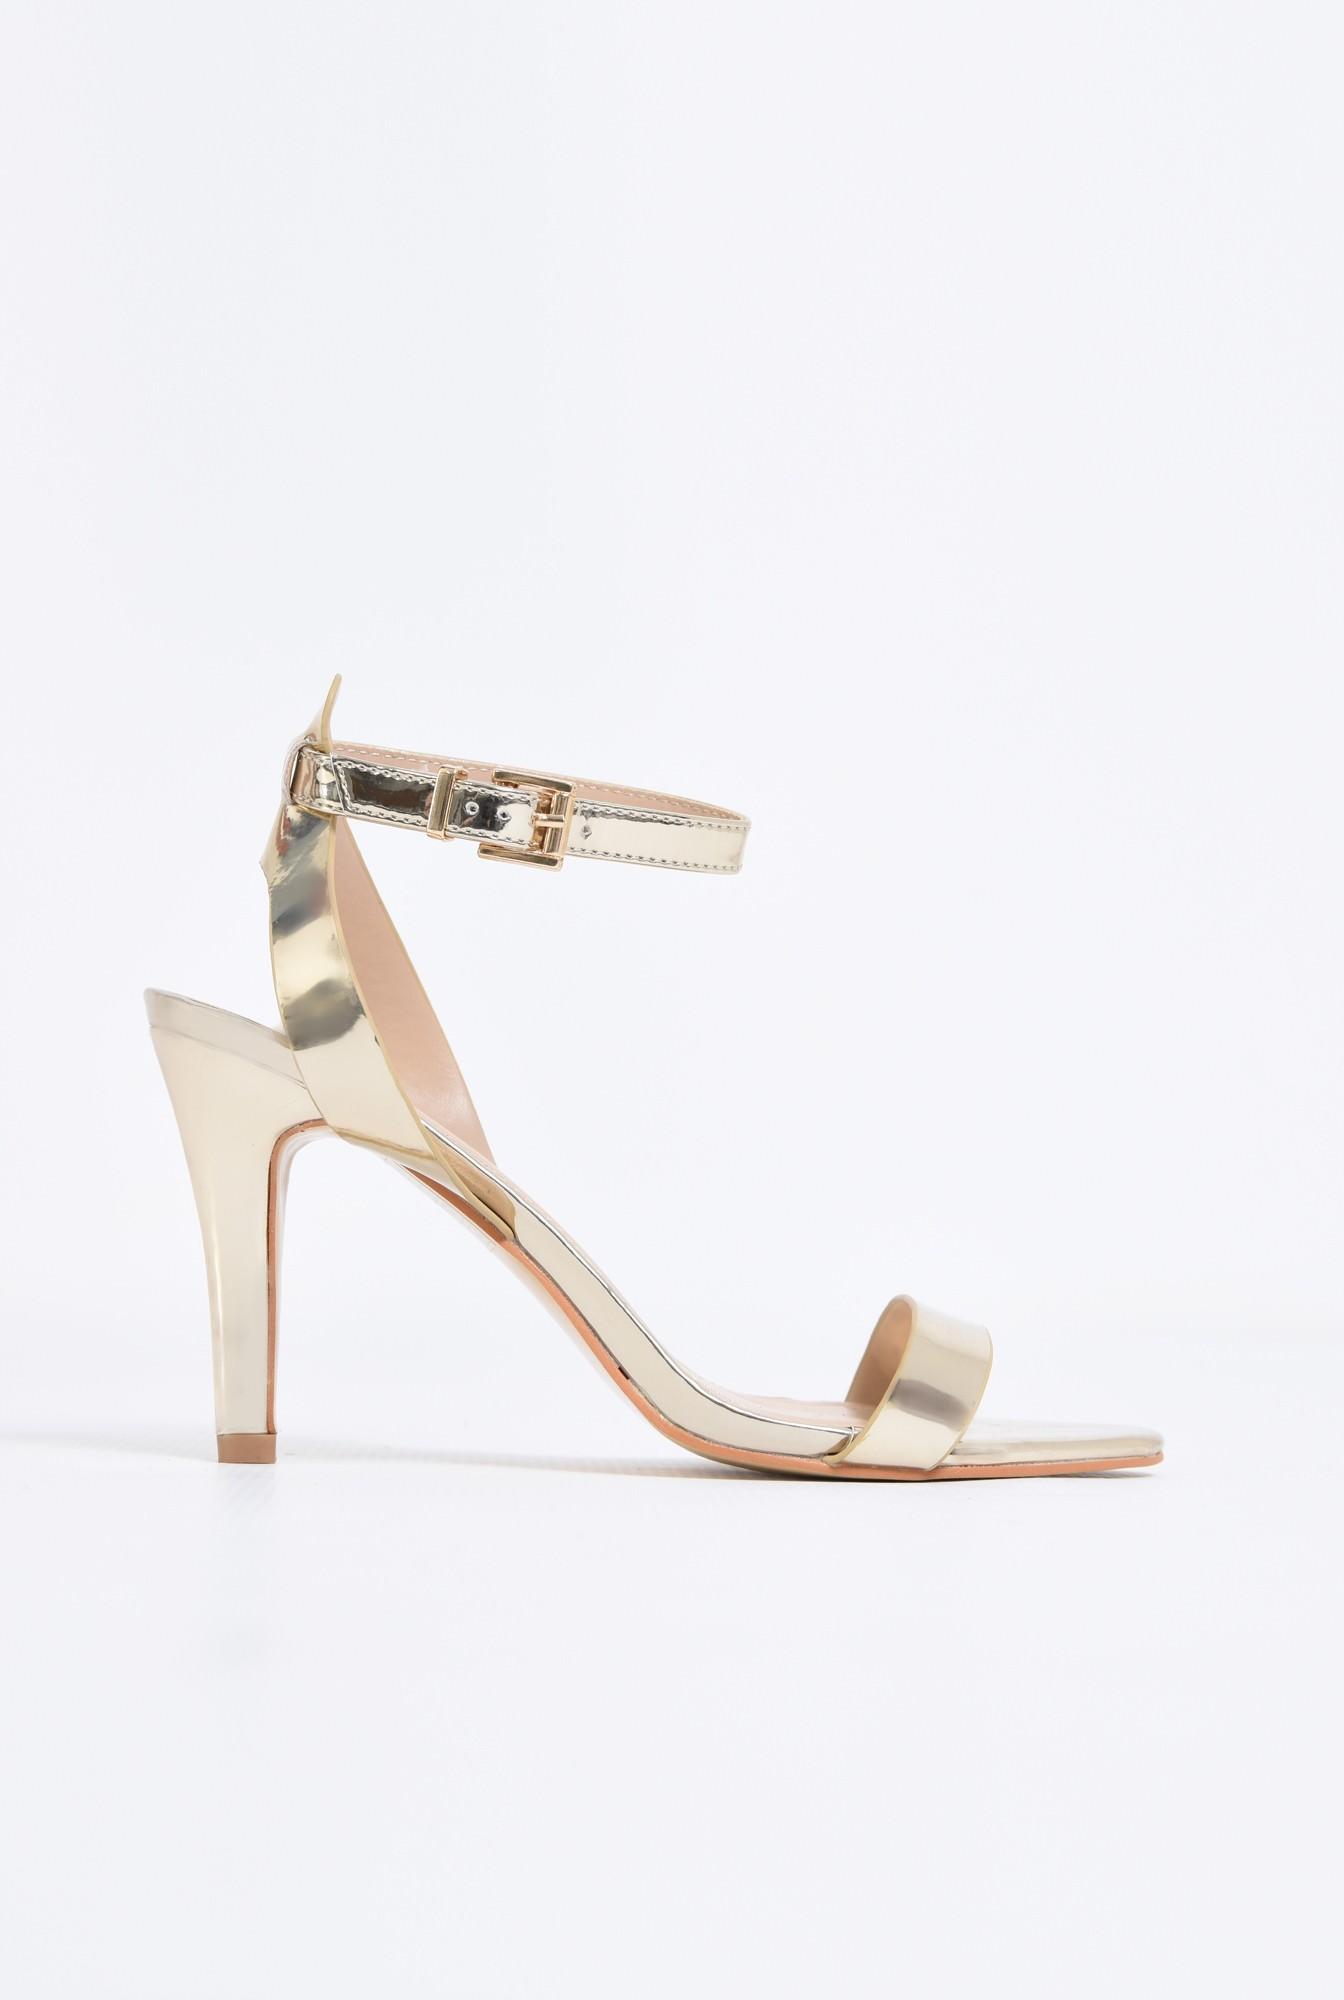 sandale elegante, aurii, cu toc subtire